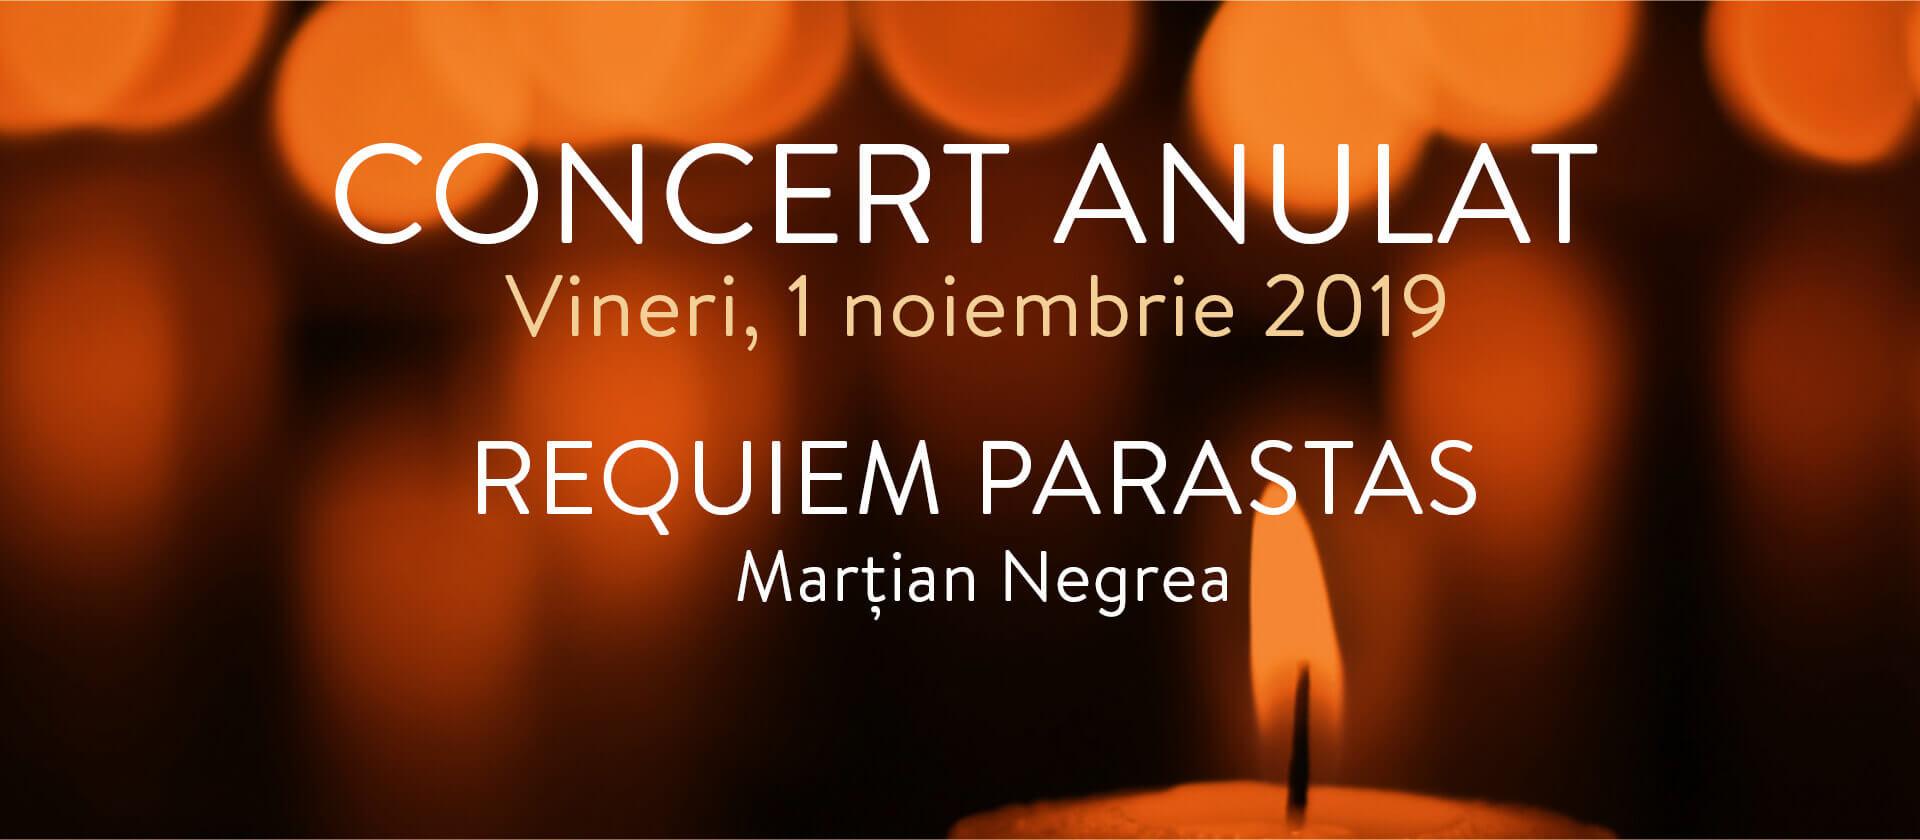 "Concertul ""REQUIEM PARASTAS"", de vineri, 01.11.2019, a fost anulat"